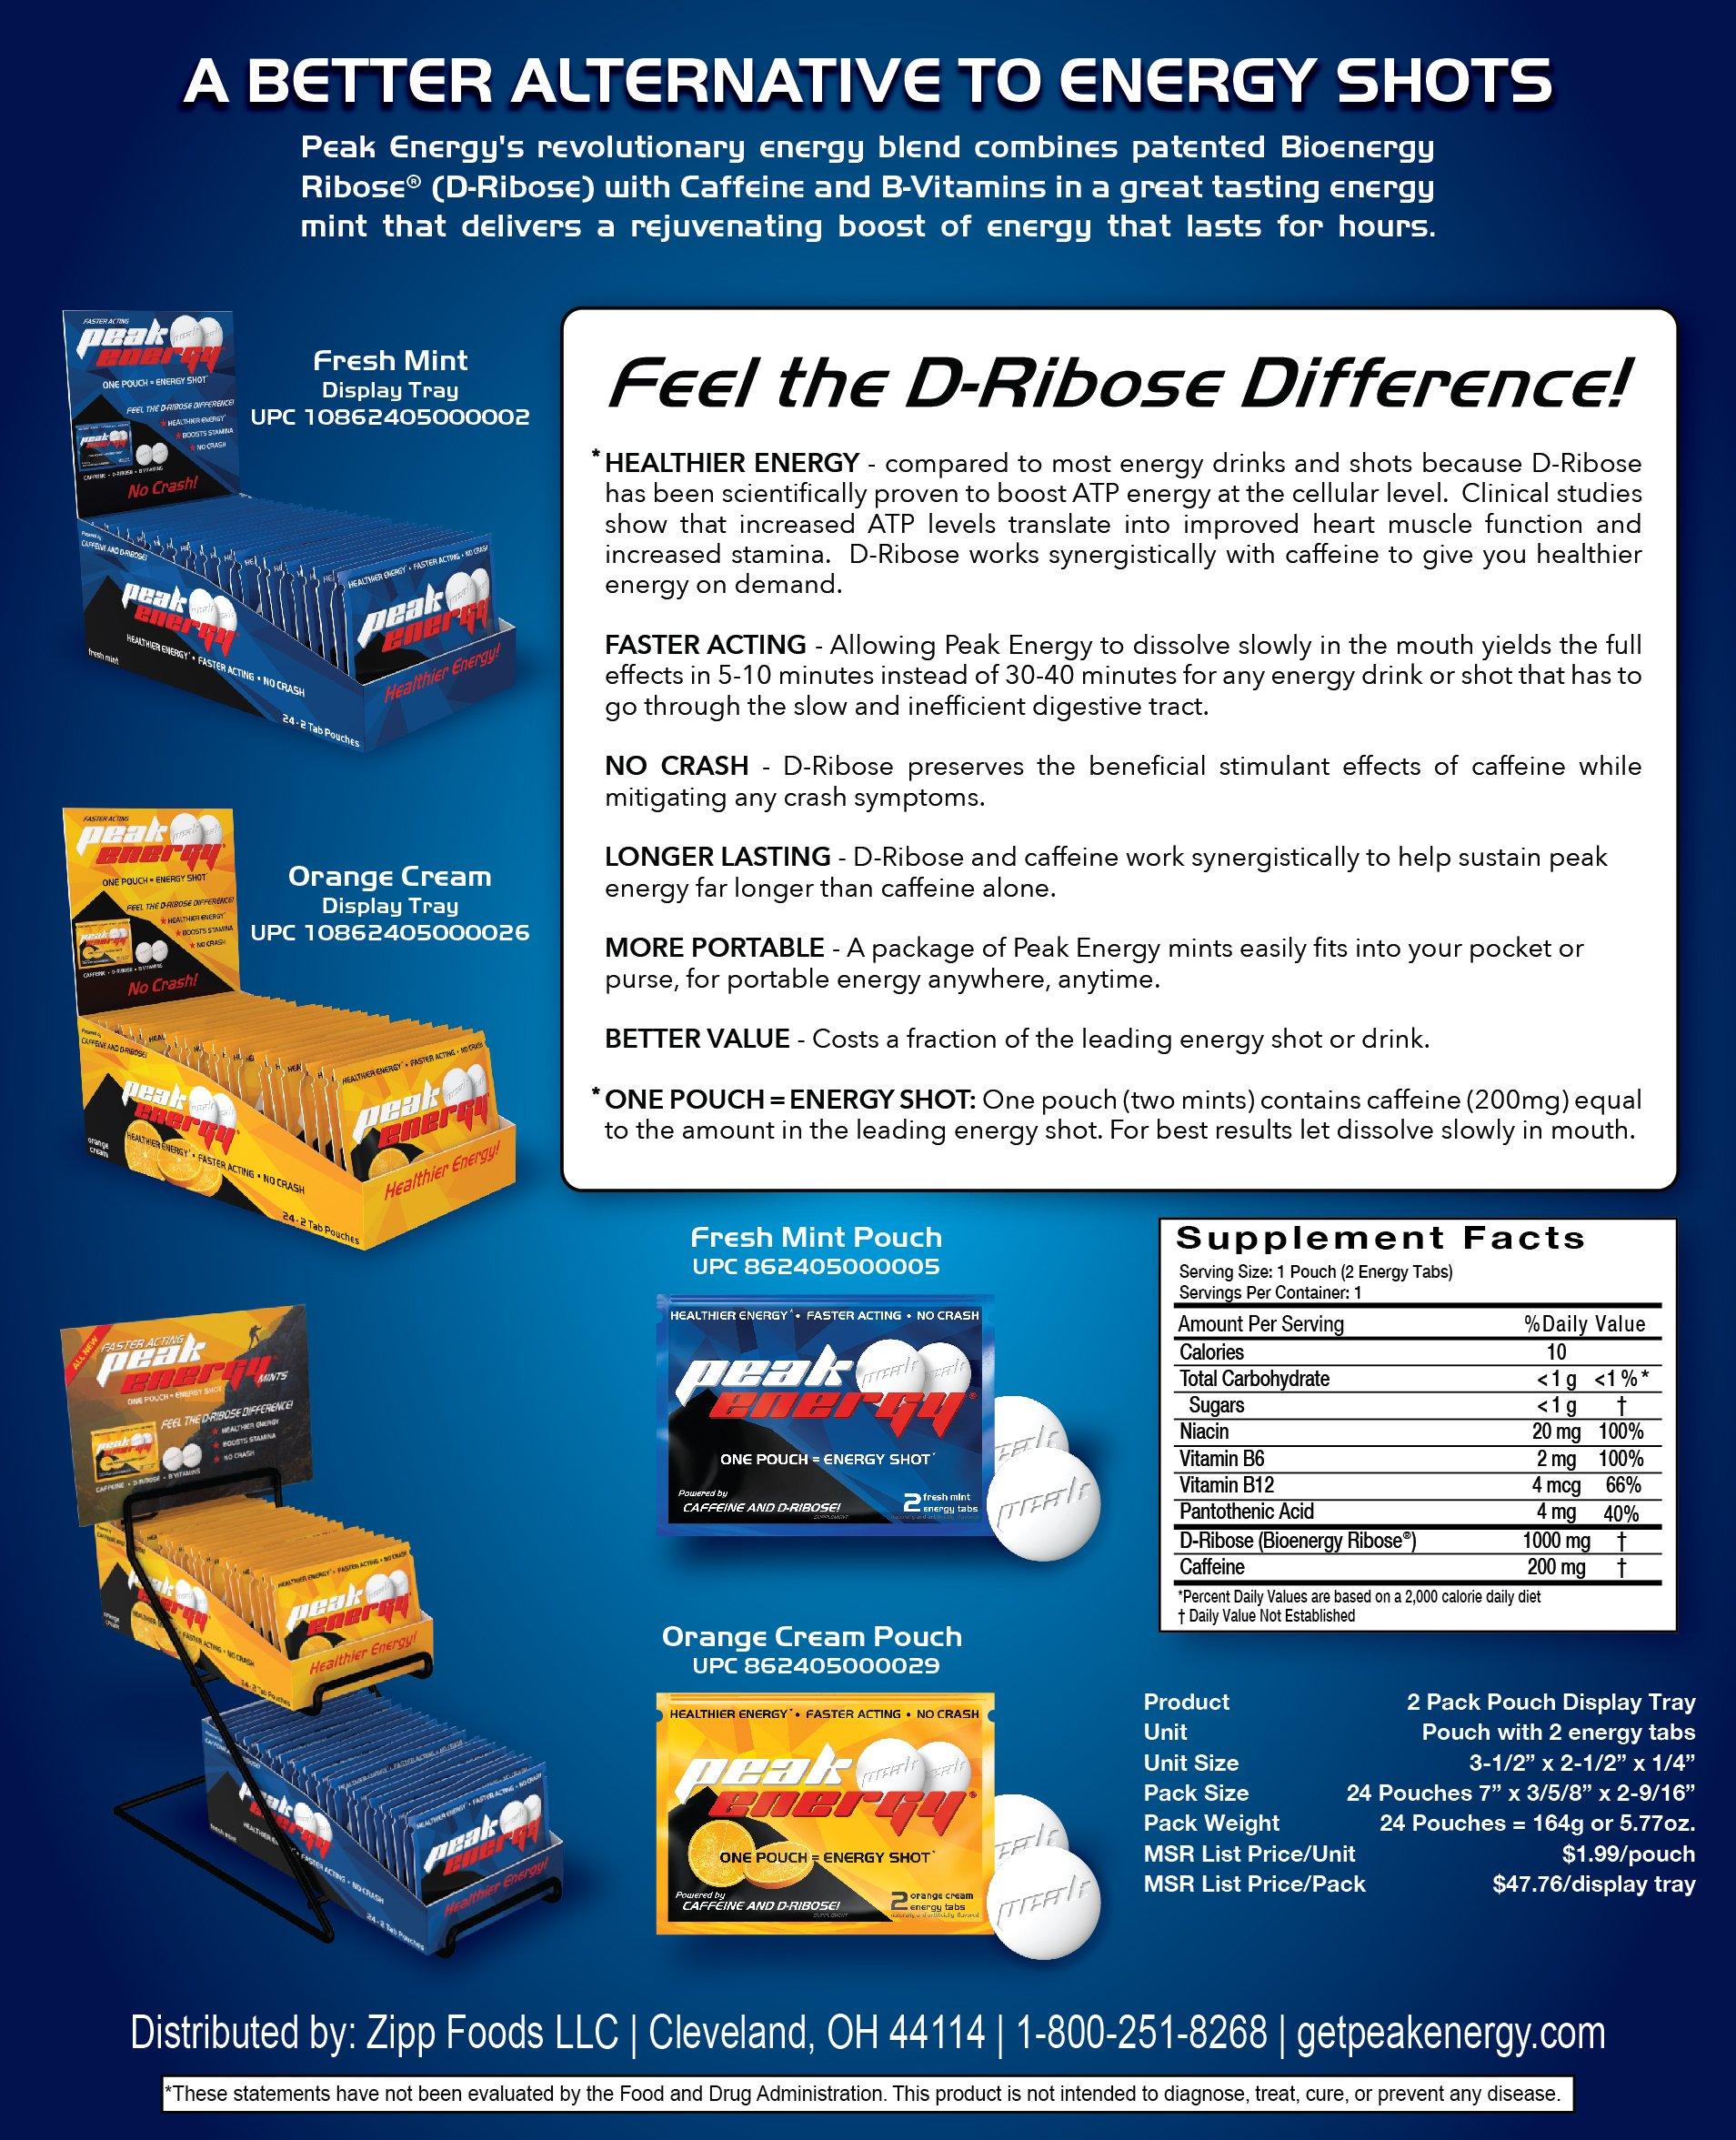 Caffeine and D-Ribose Energy Mints - 100mg Caffeine per mint - 24 Pouch Box - Orange Cream Flavor by Peak Energy (Image #7)